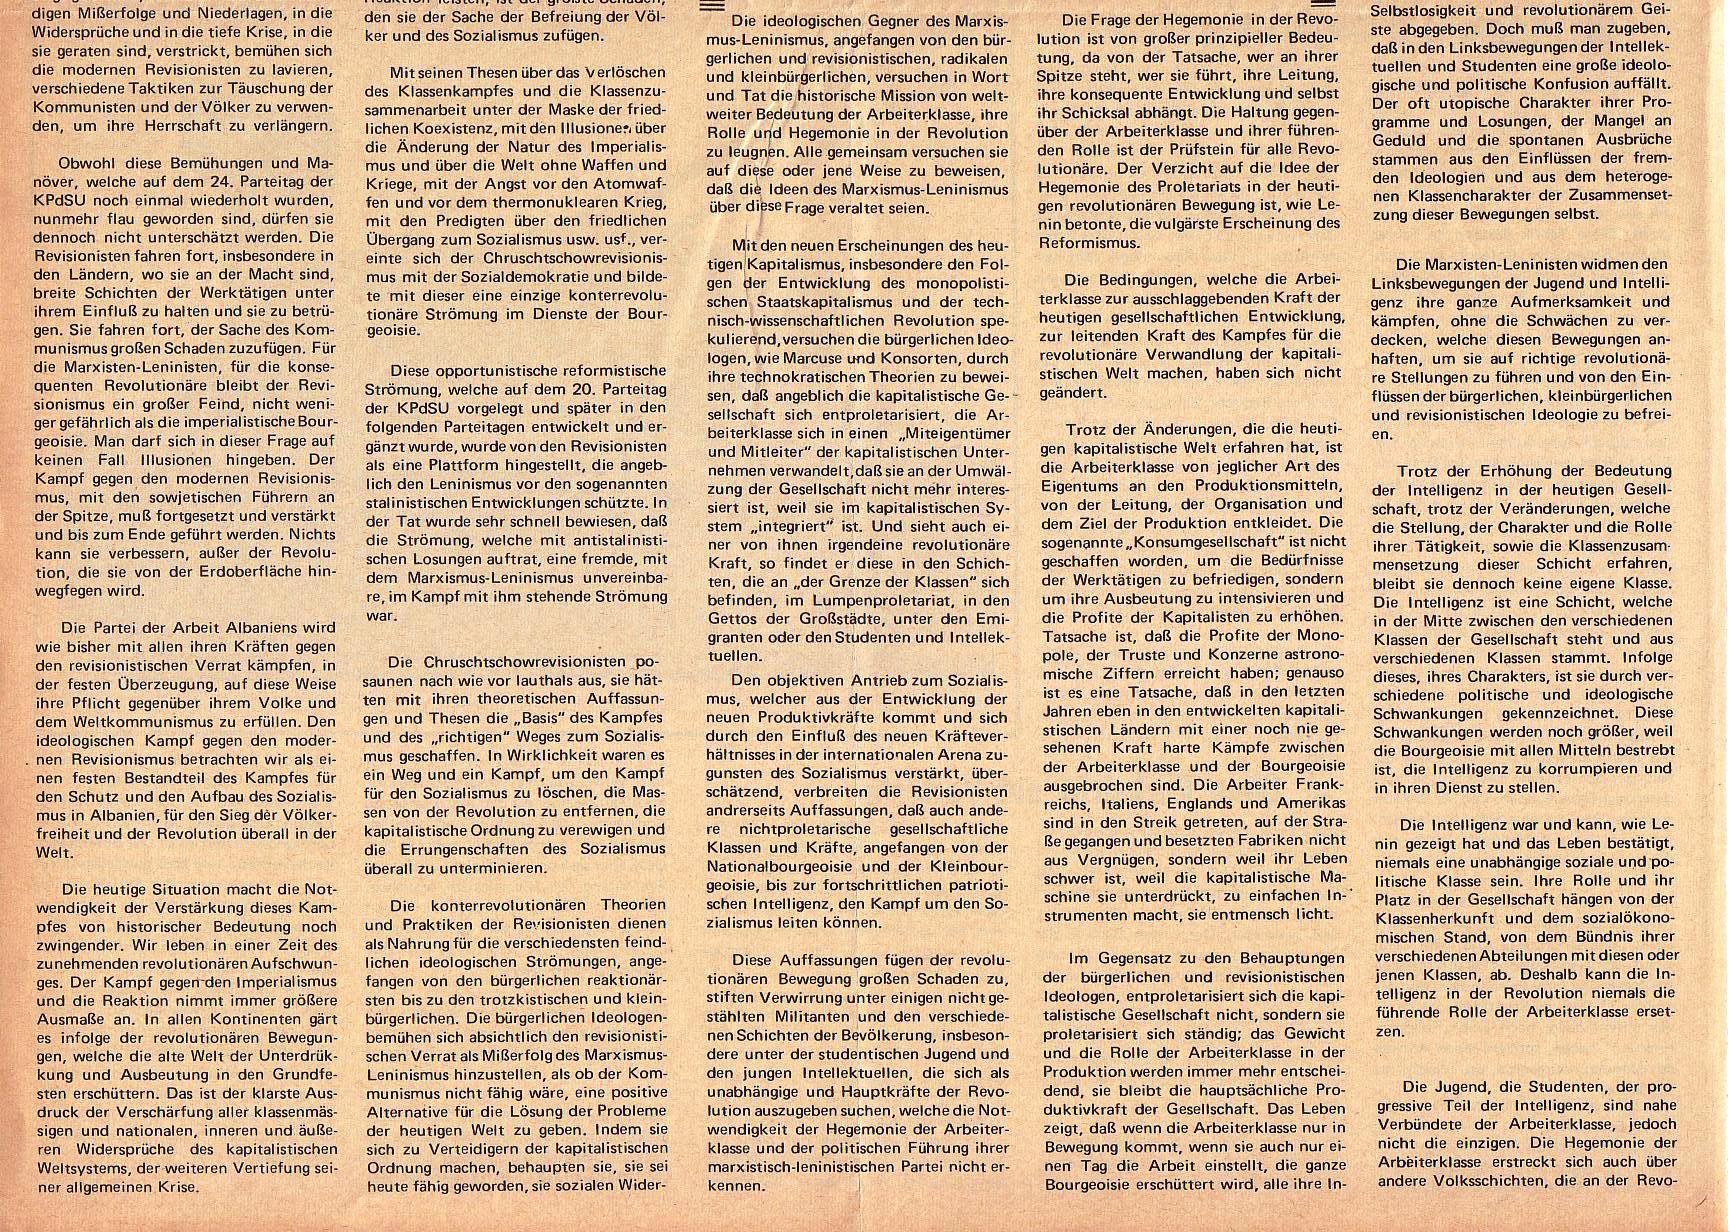 Roter Morgen, 5. Jg., 6. Dezember 1971, Nr. 15, Seite 4b